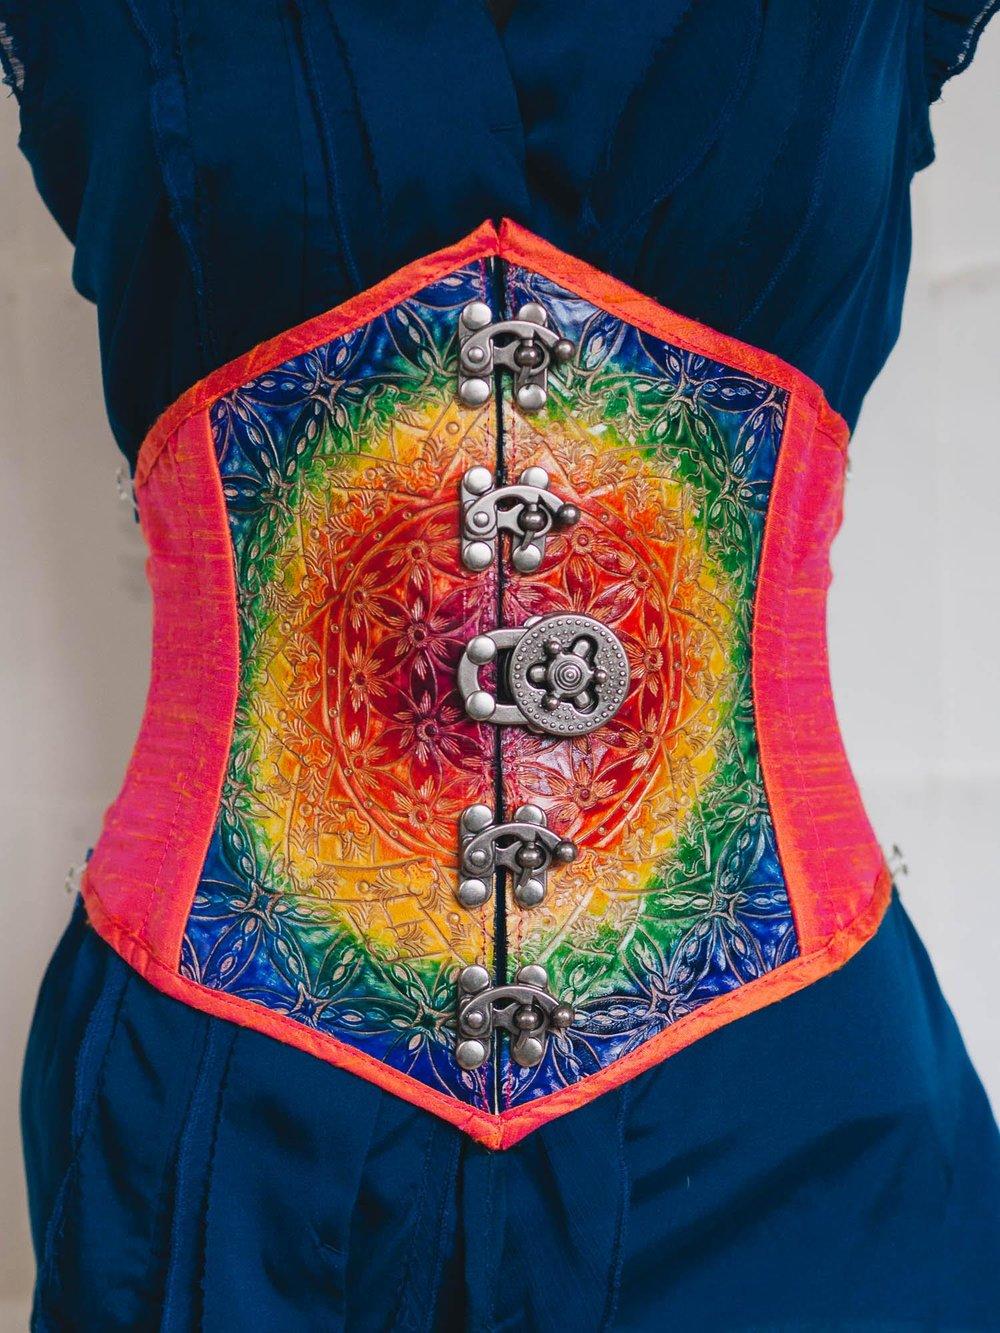 raindbow-waist-cincher-front.jpg